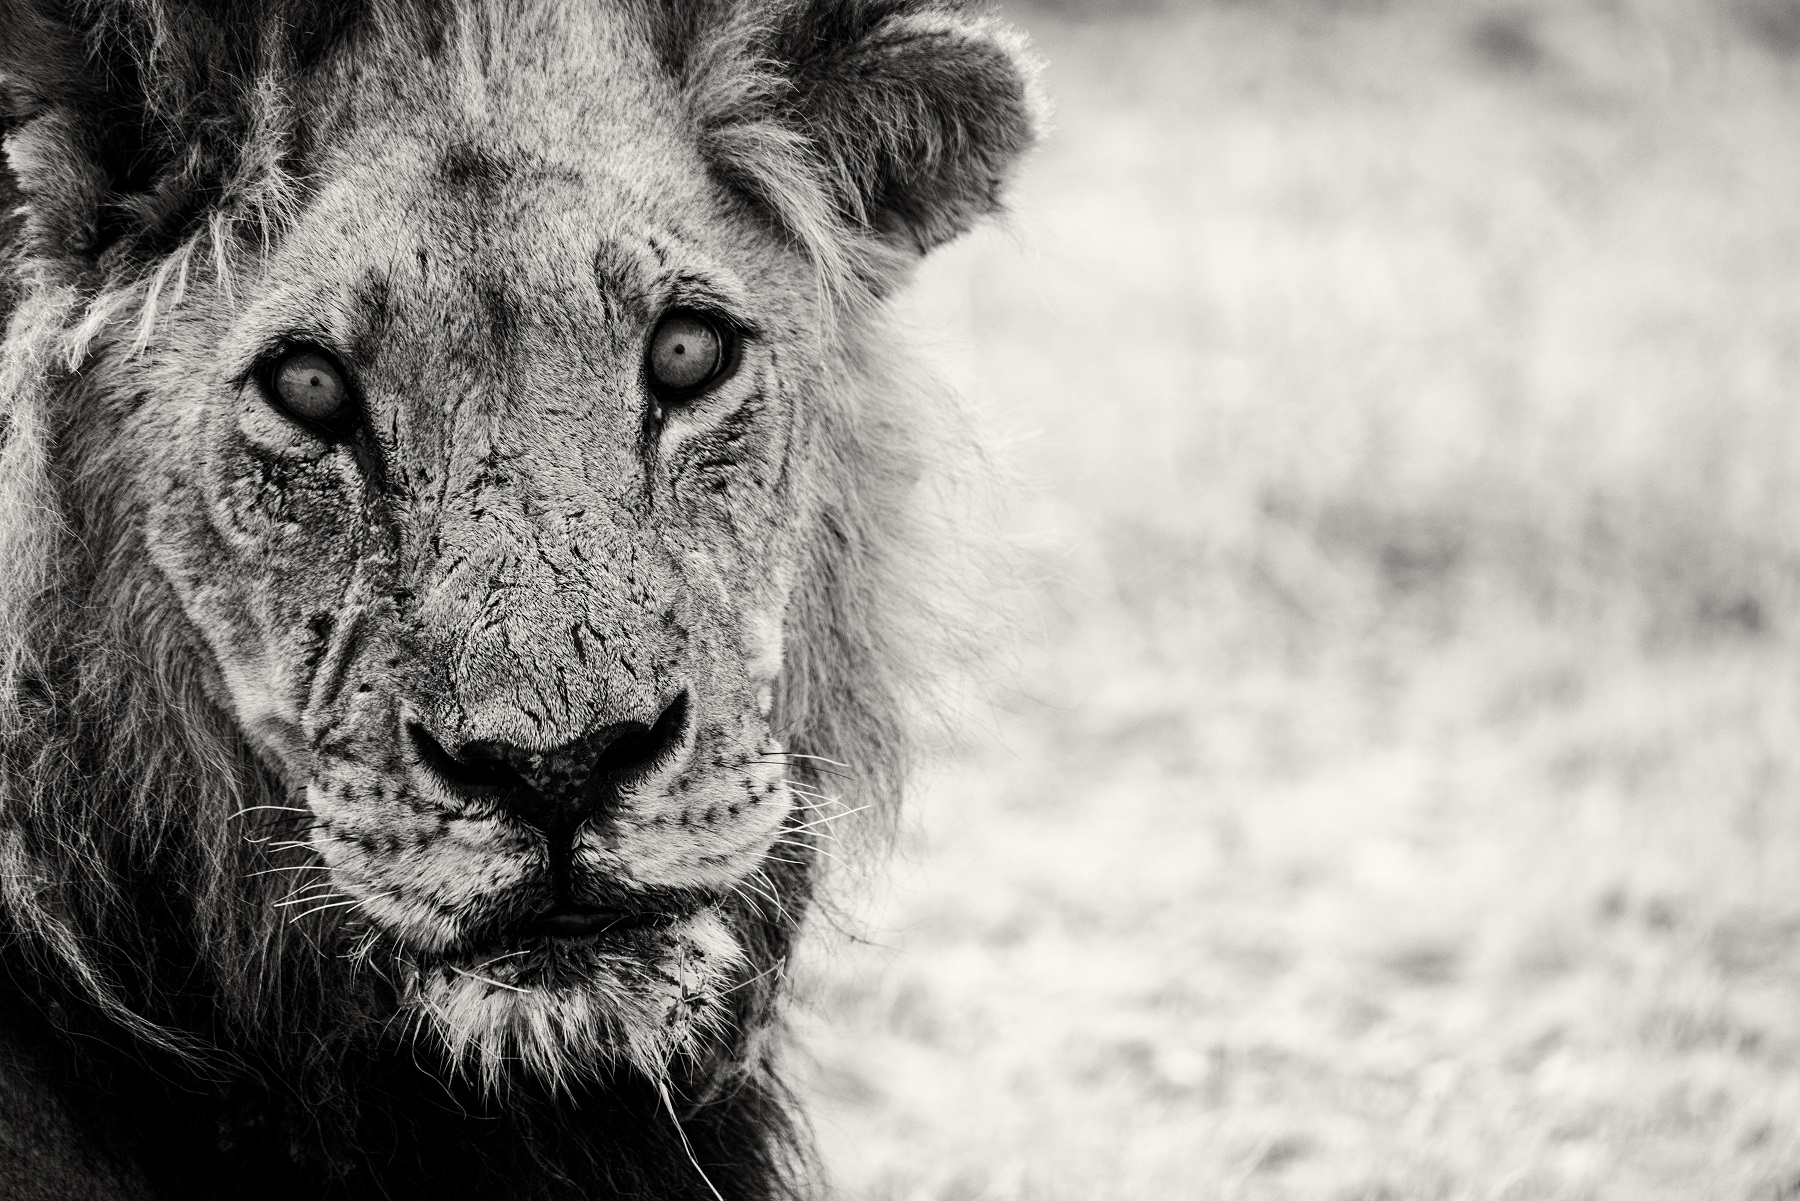 Kathleen Gerber_Lion's Gaze.jpg